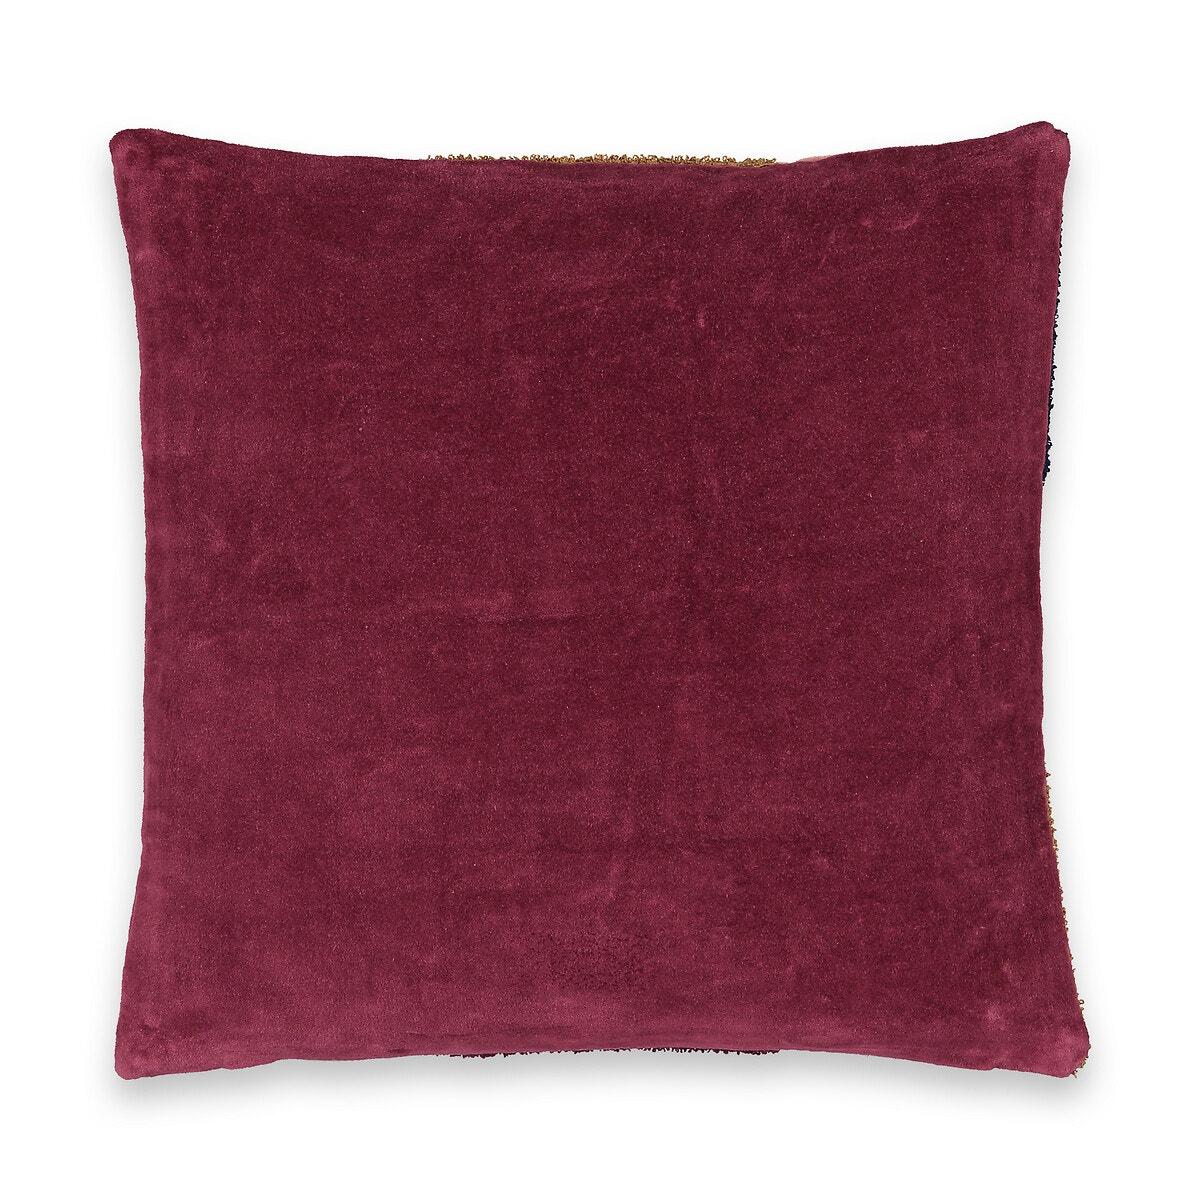 Pileo Textured Cotton Cushion Cover